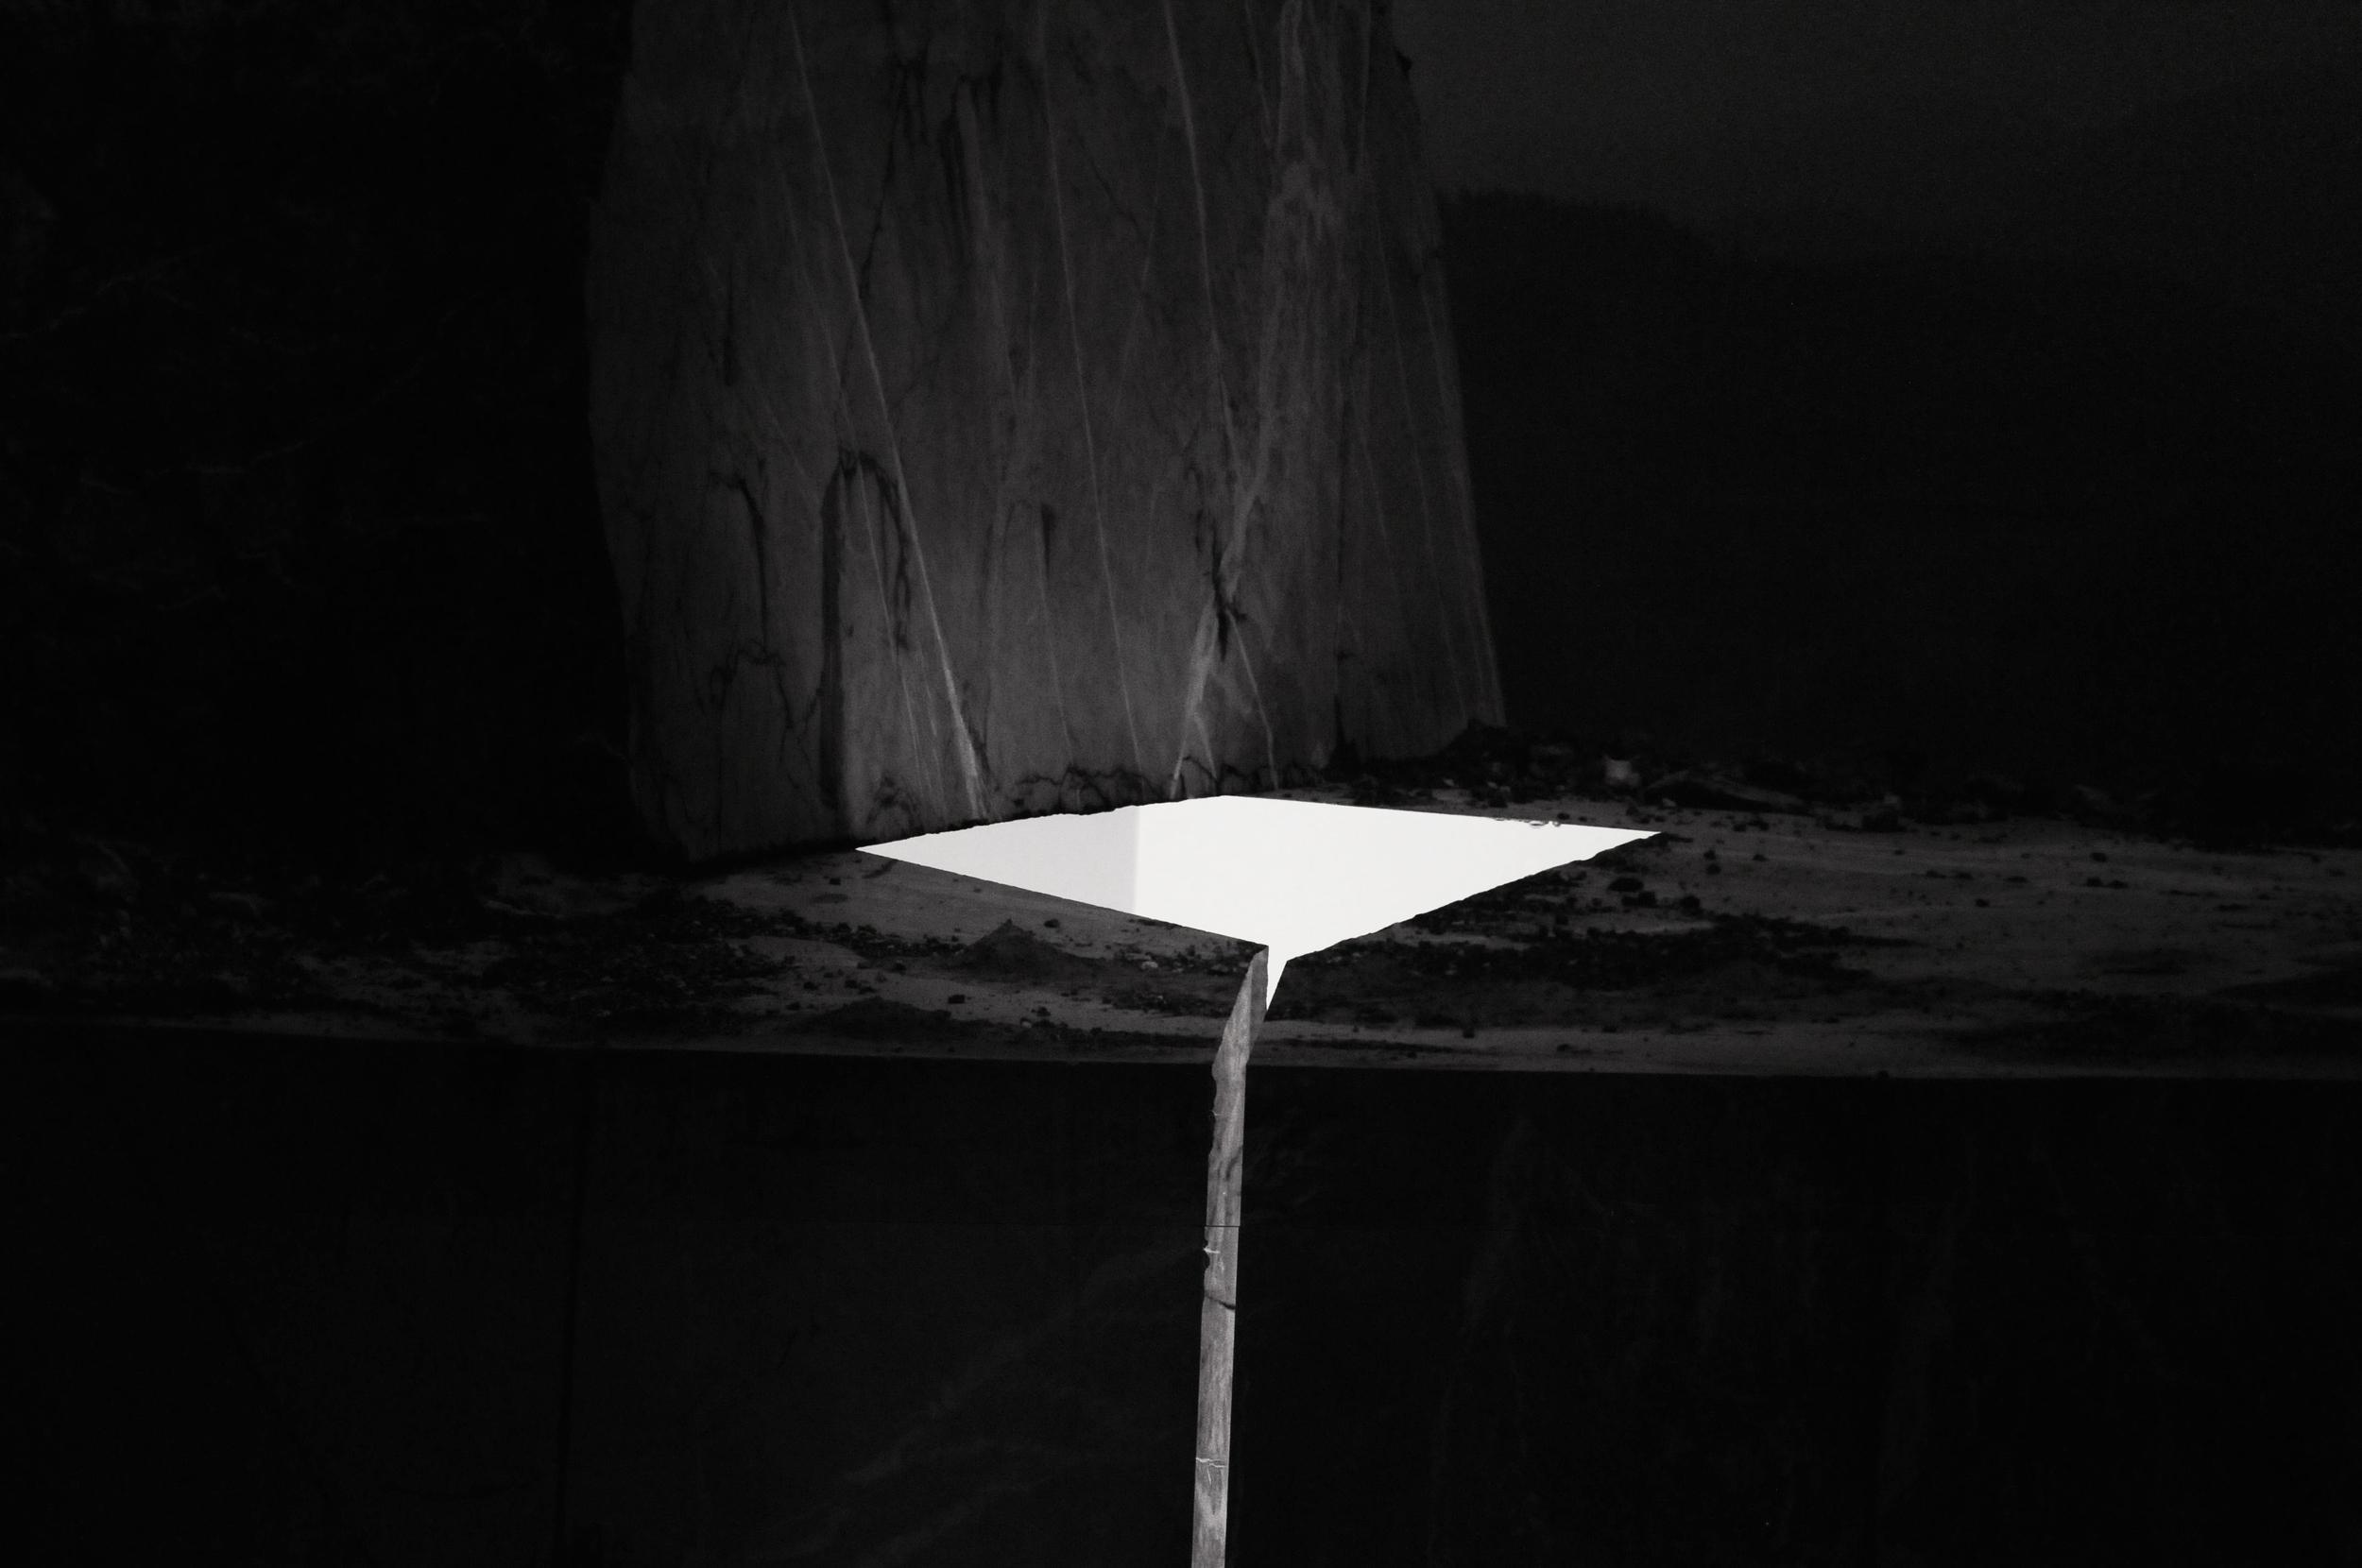 aitor ortiz exhibition photography by floriana castagna | S/TUDIO